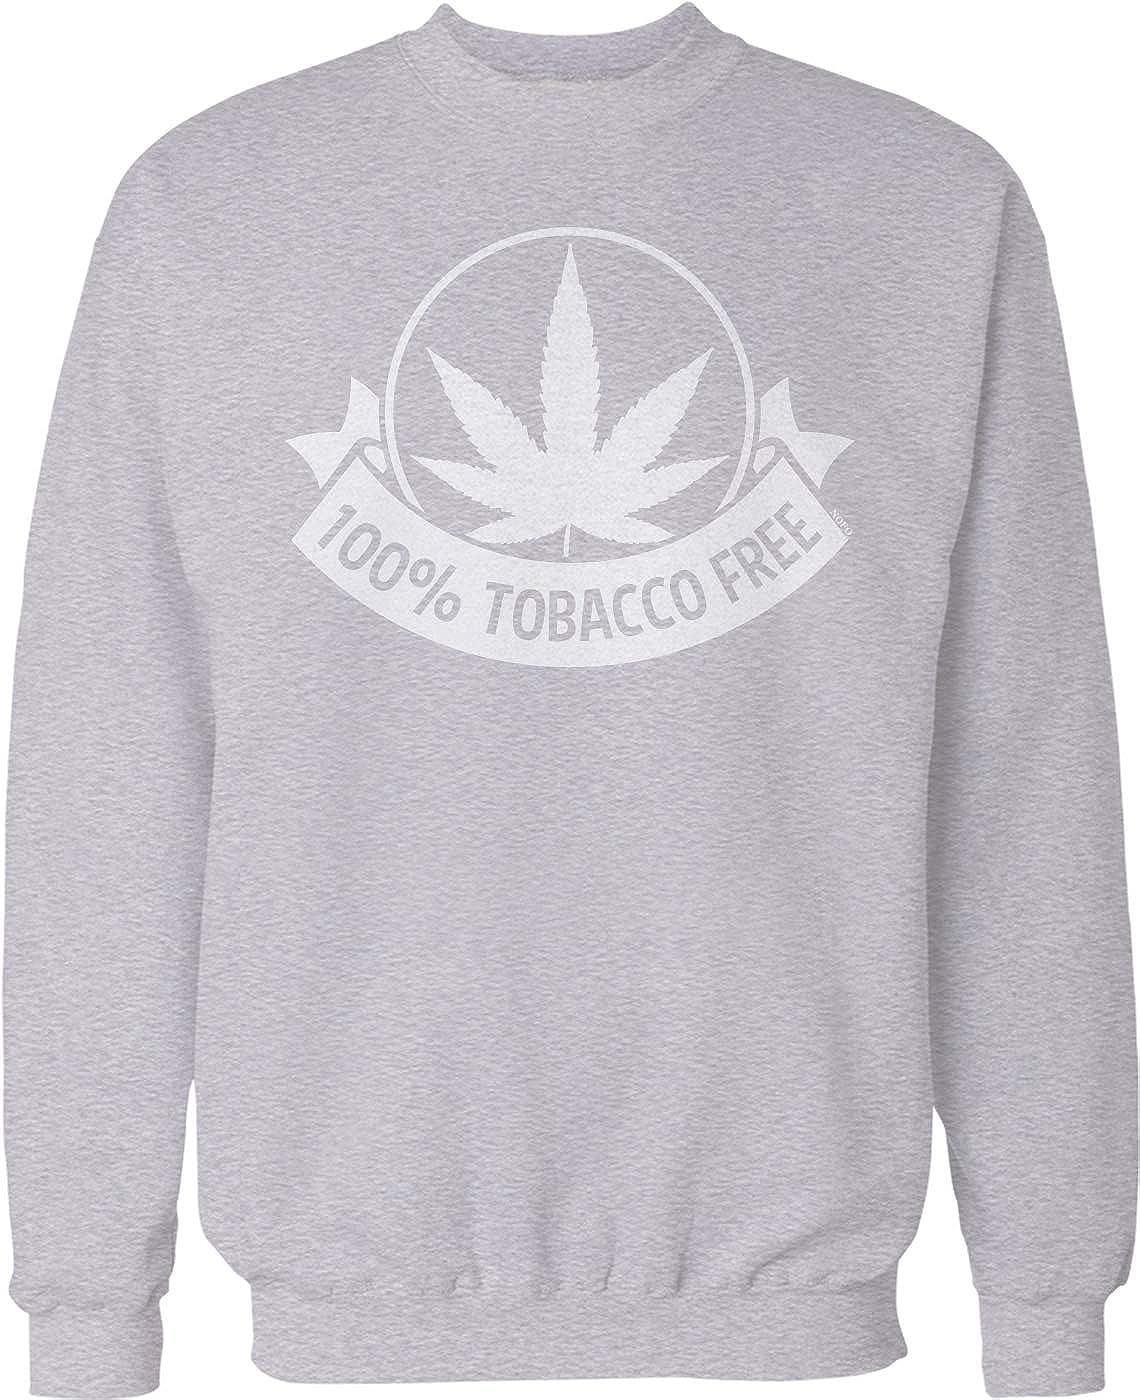 NOFO Clothing Co 100/% Tobacco Free Crew Neck Sweatshirt